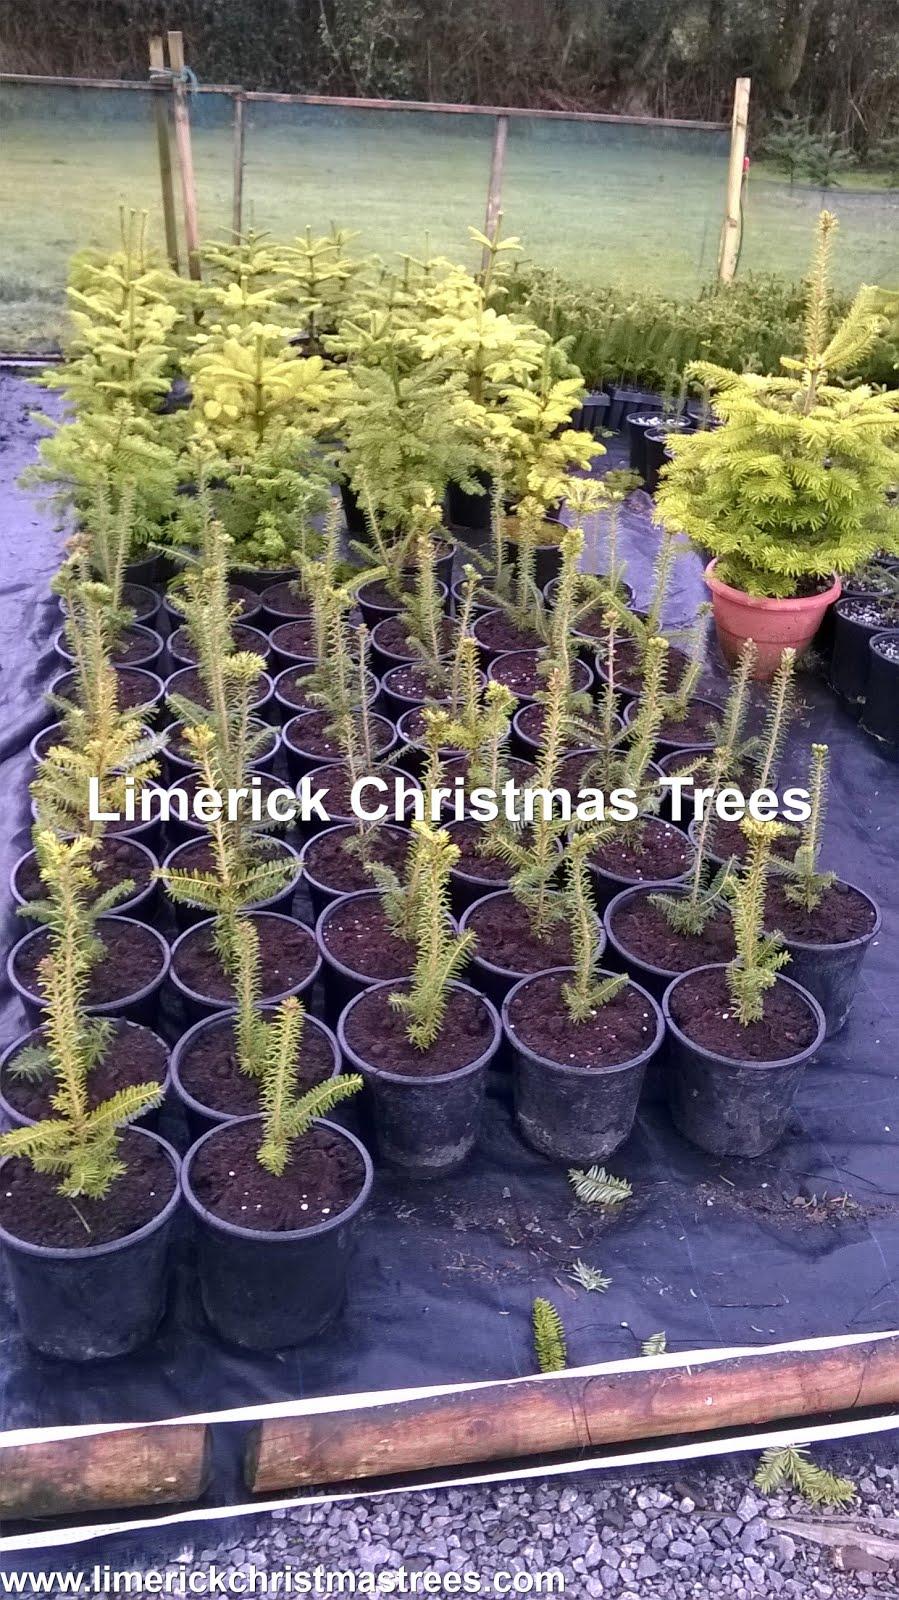 Limerick Christmas Tree Centre: Pot Growing Christmas Trees